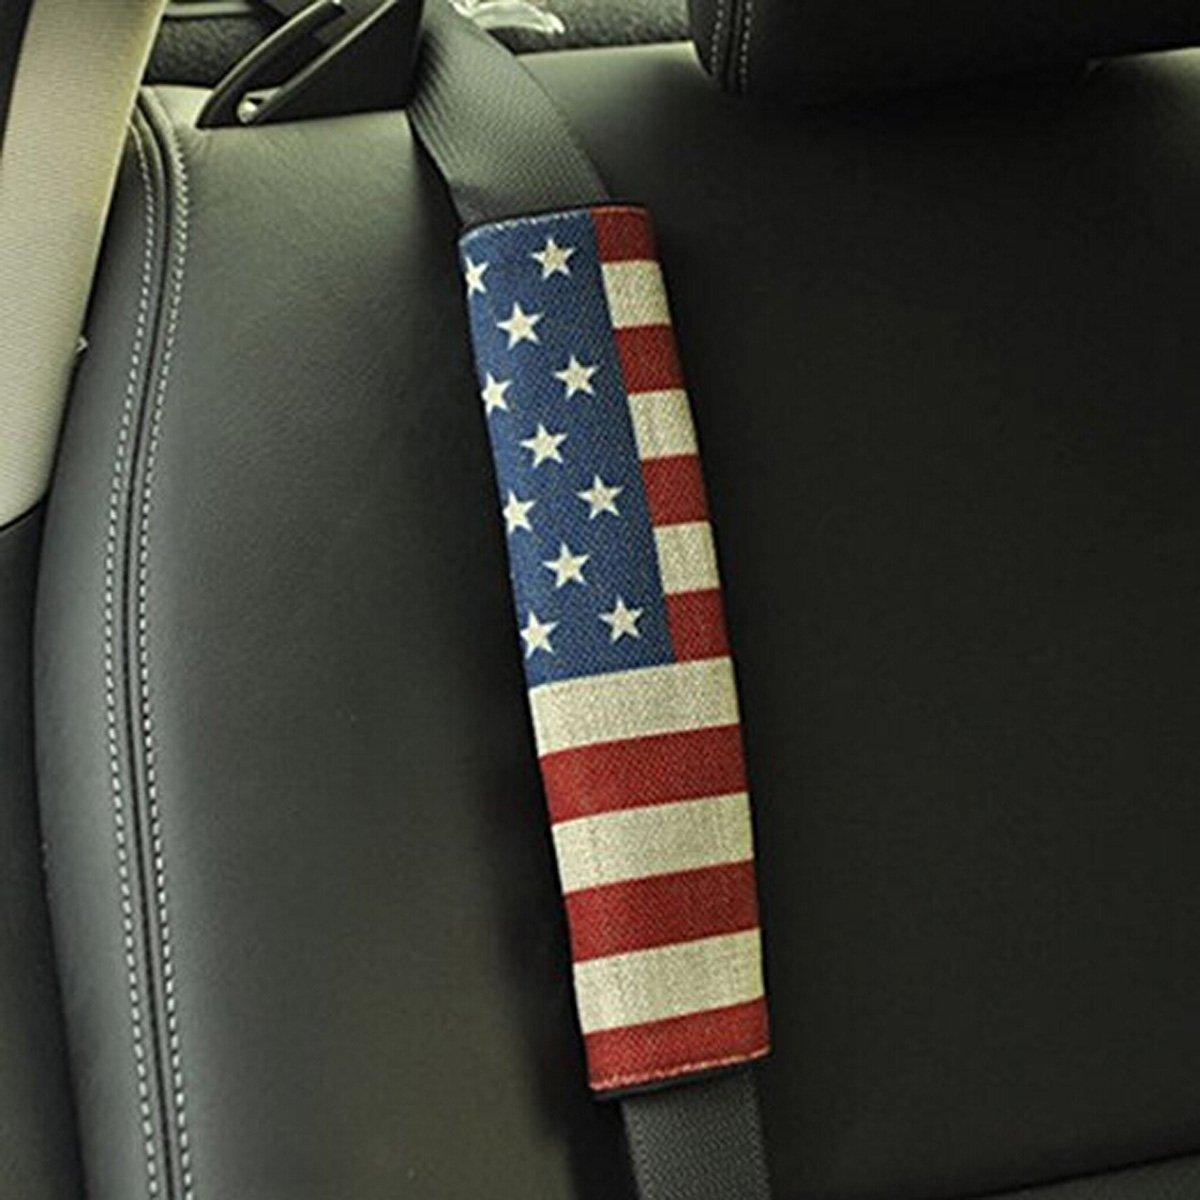 Car Truck Owners Comfortable Driving for Jeep Toyota Honda BMW Ford Chevrolet Nissan Subaru Hyundai VW Mustang Corvette Volvo Audi TK-KLZ Pack-2 American US Flag Seat Belt Cover Shoulder Pad Cushion